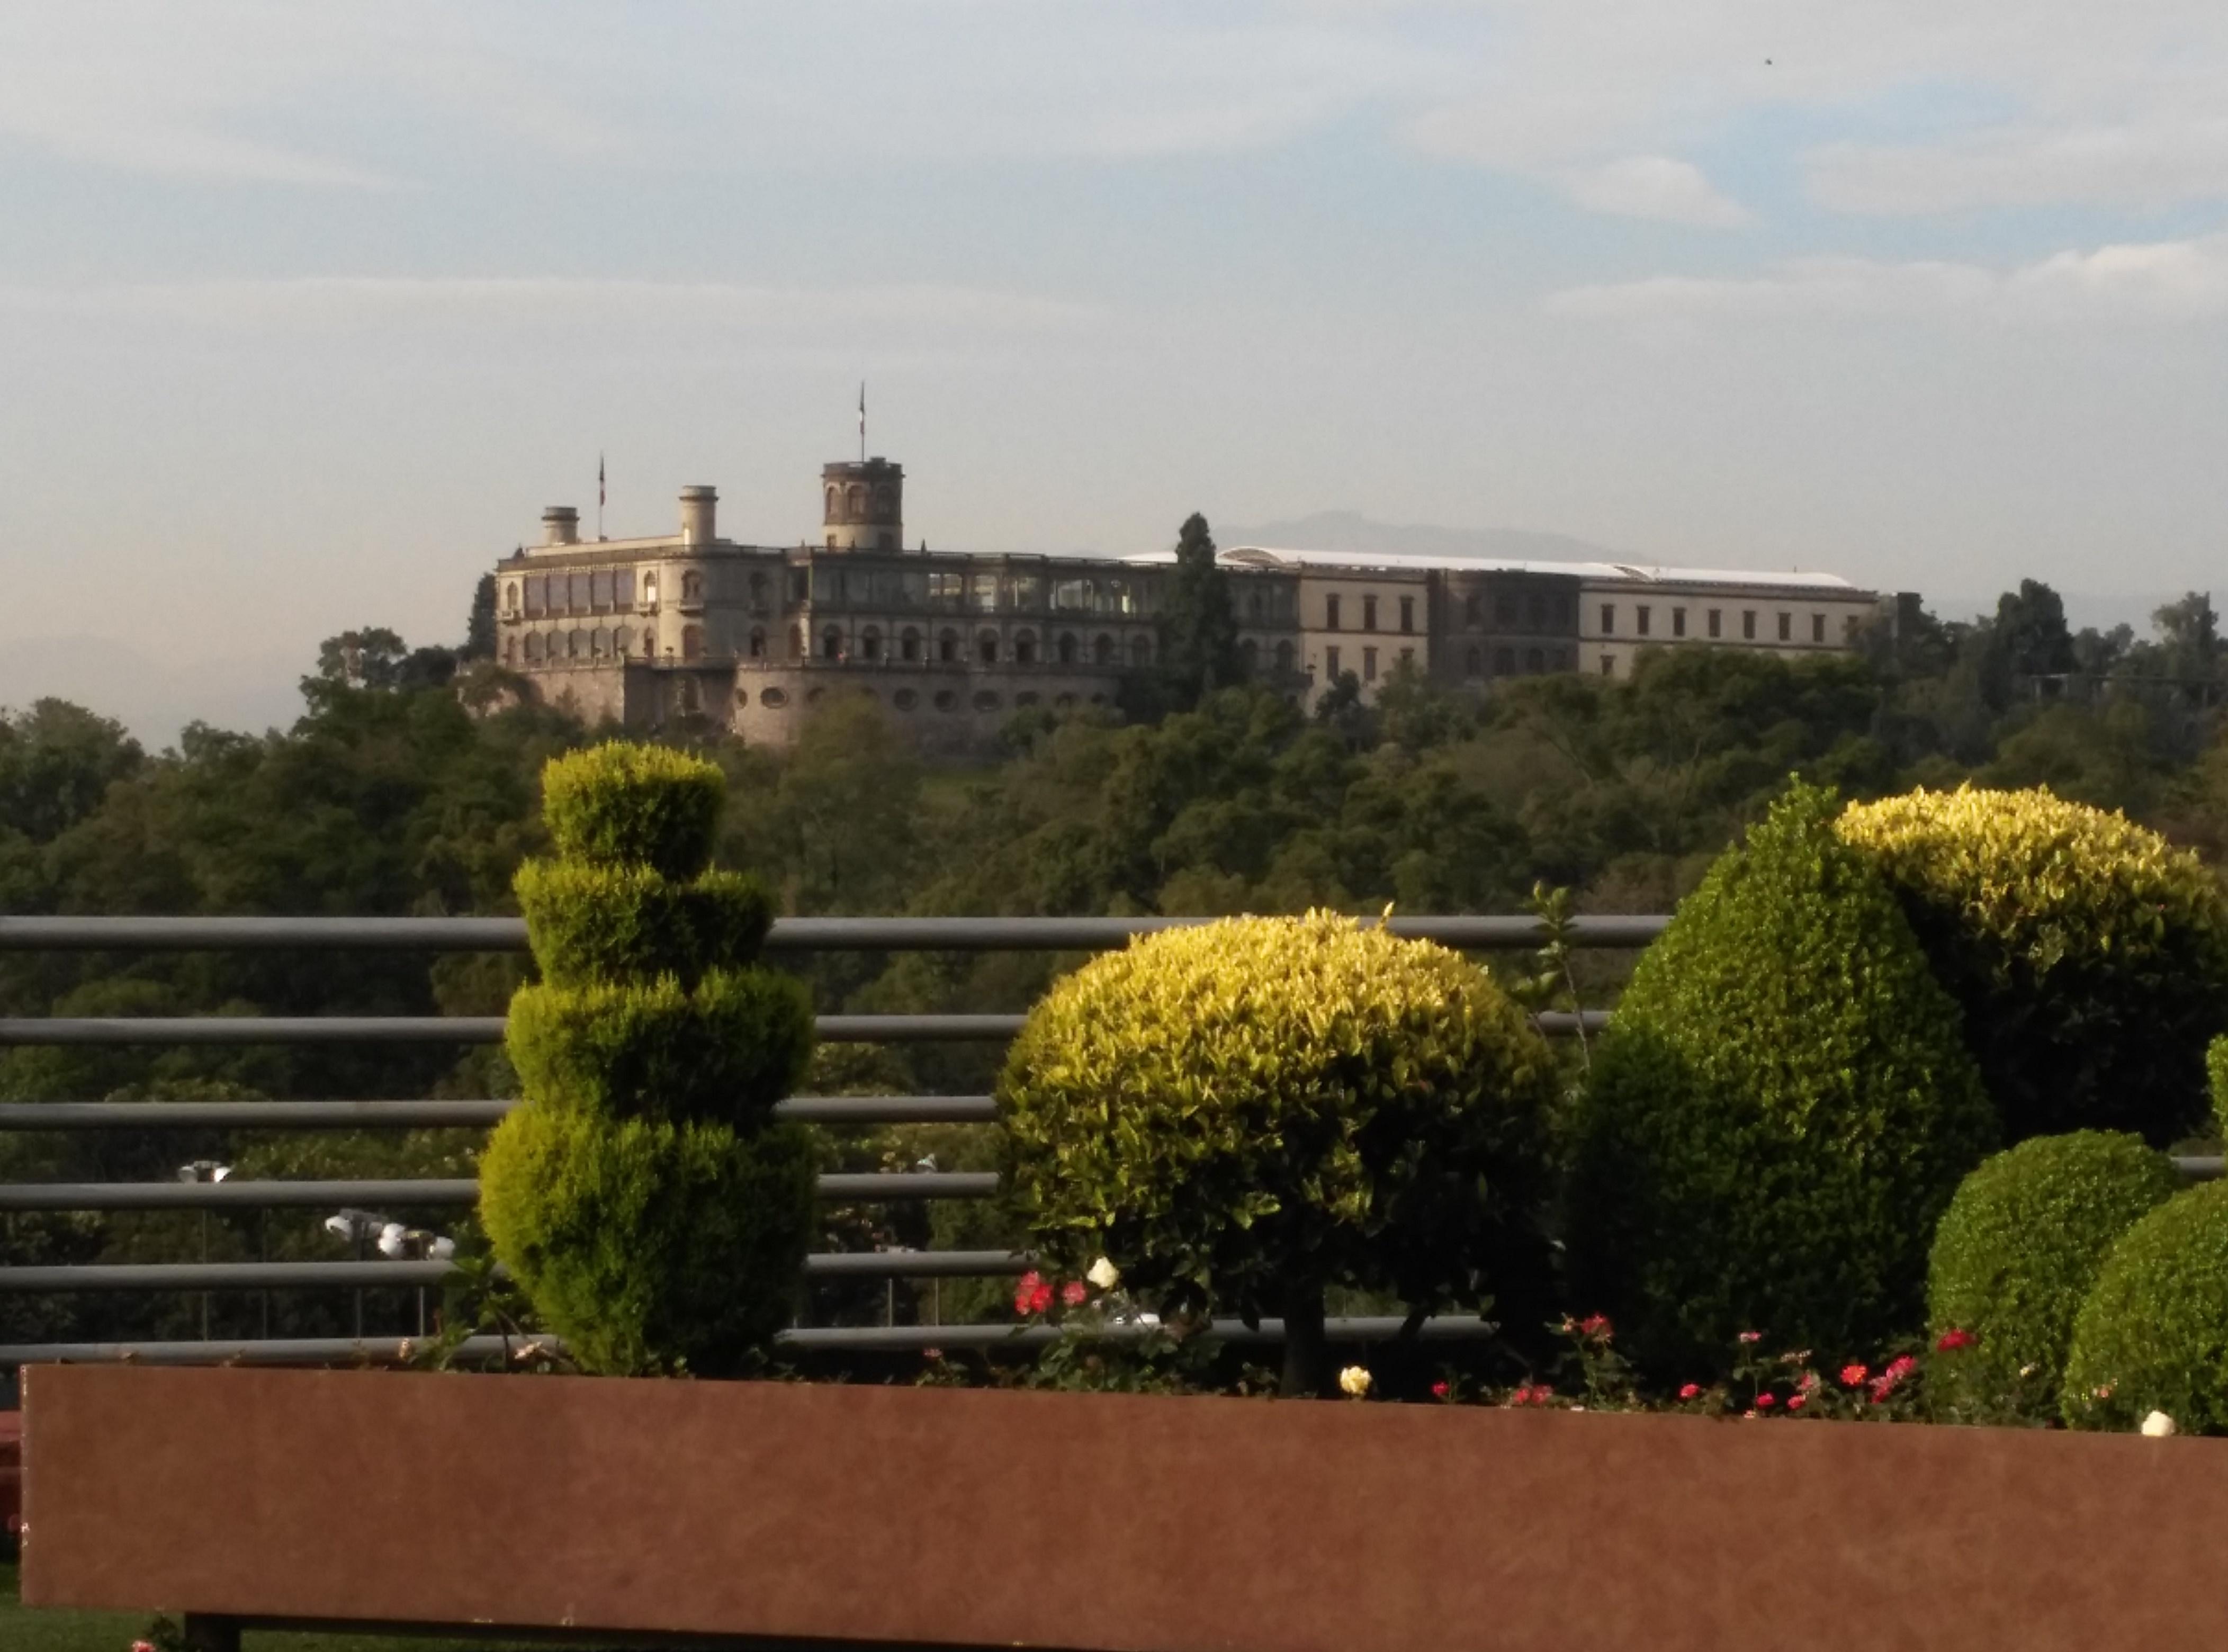 Depiction of Castillo de Chapultepec